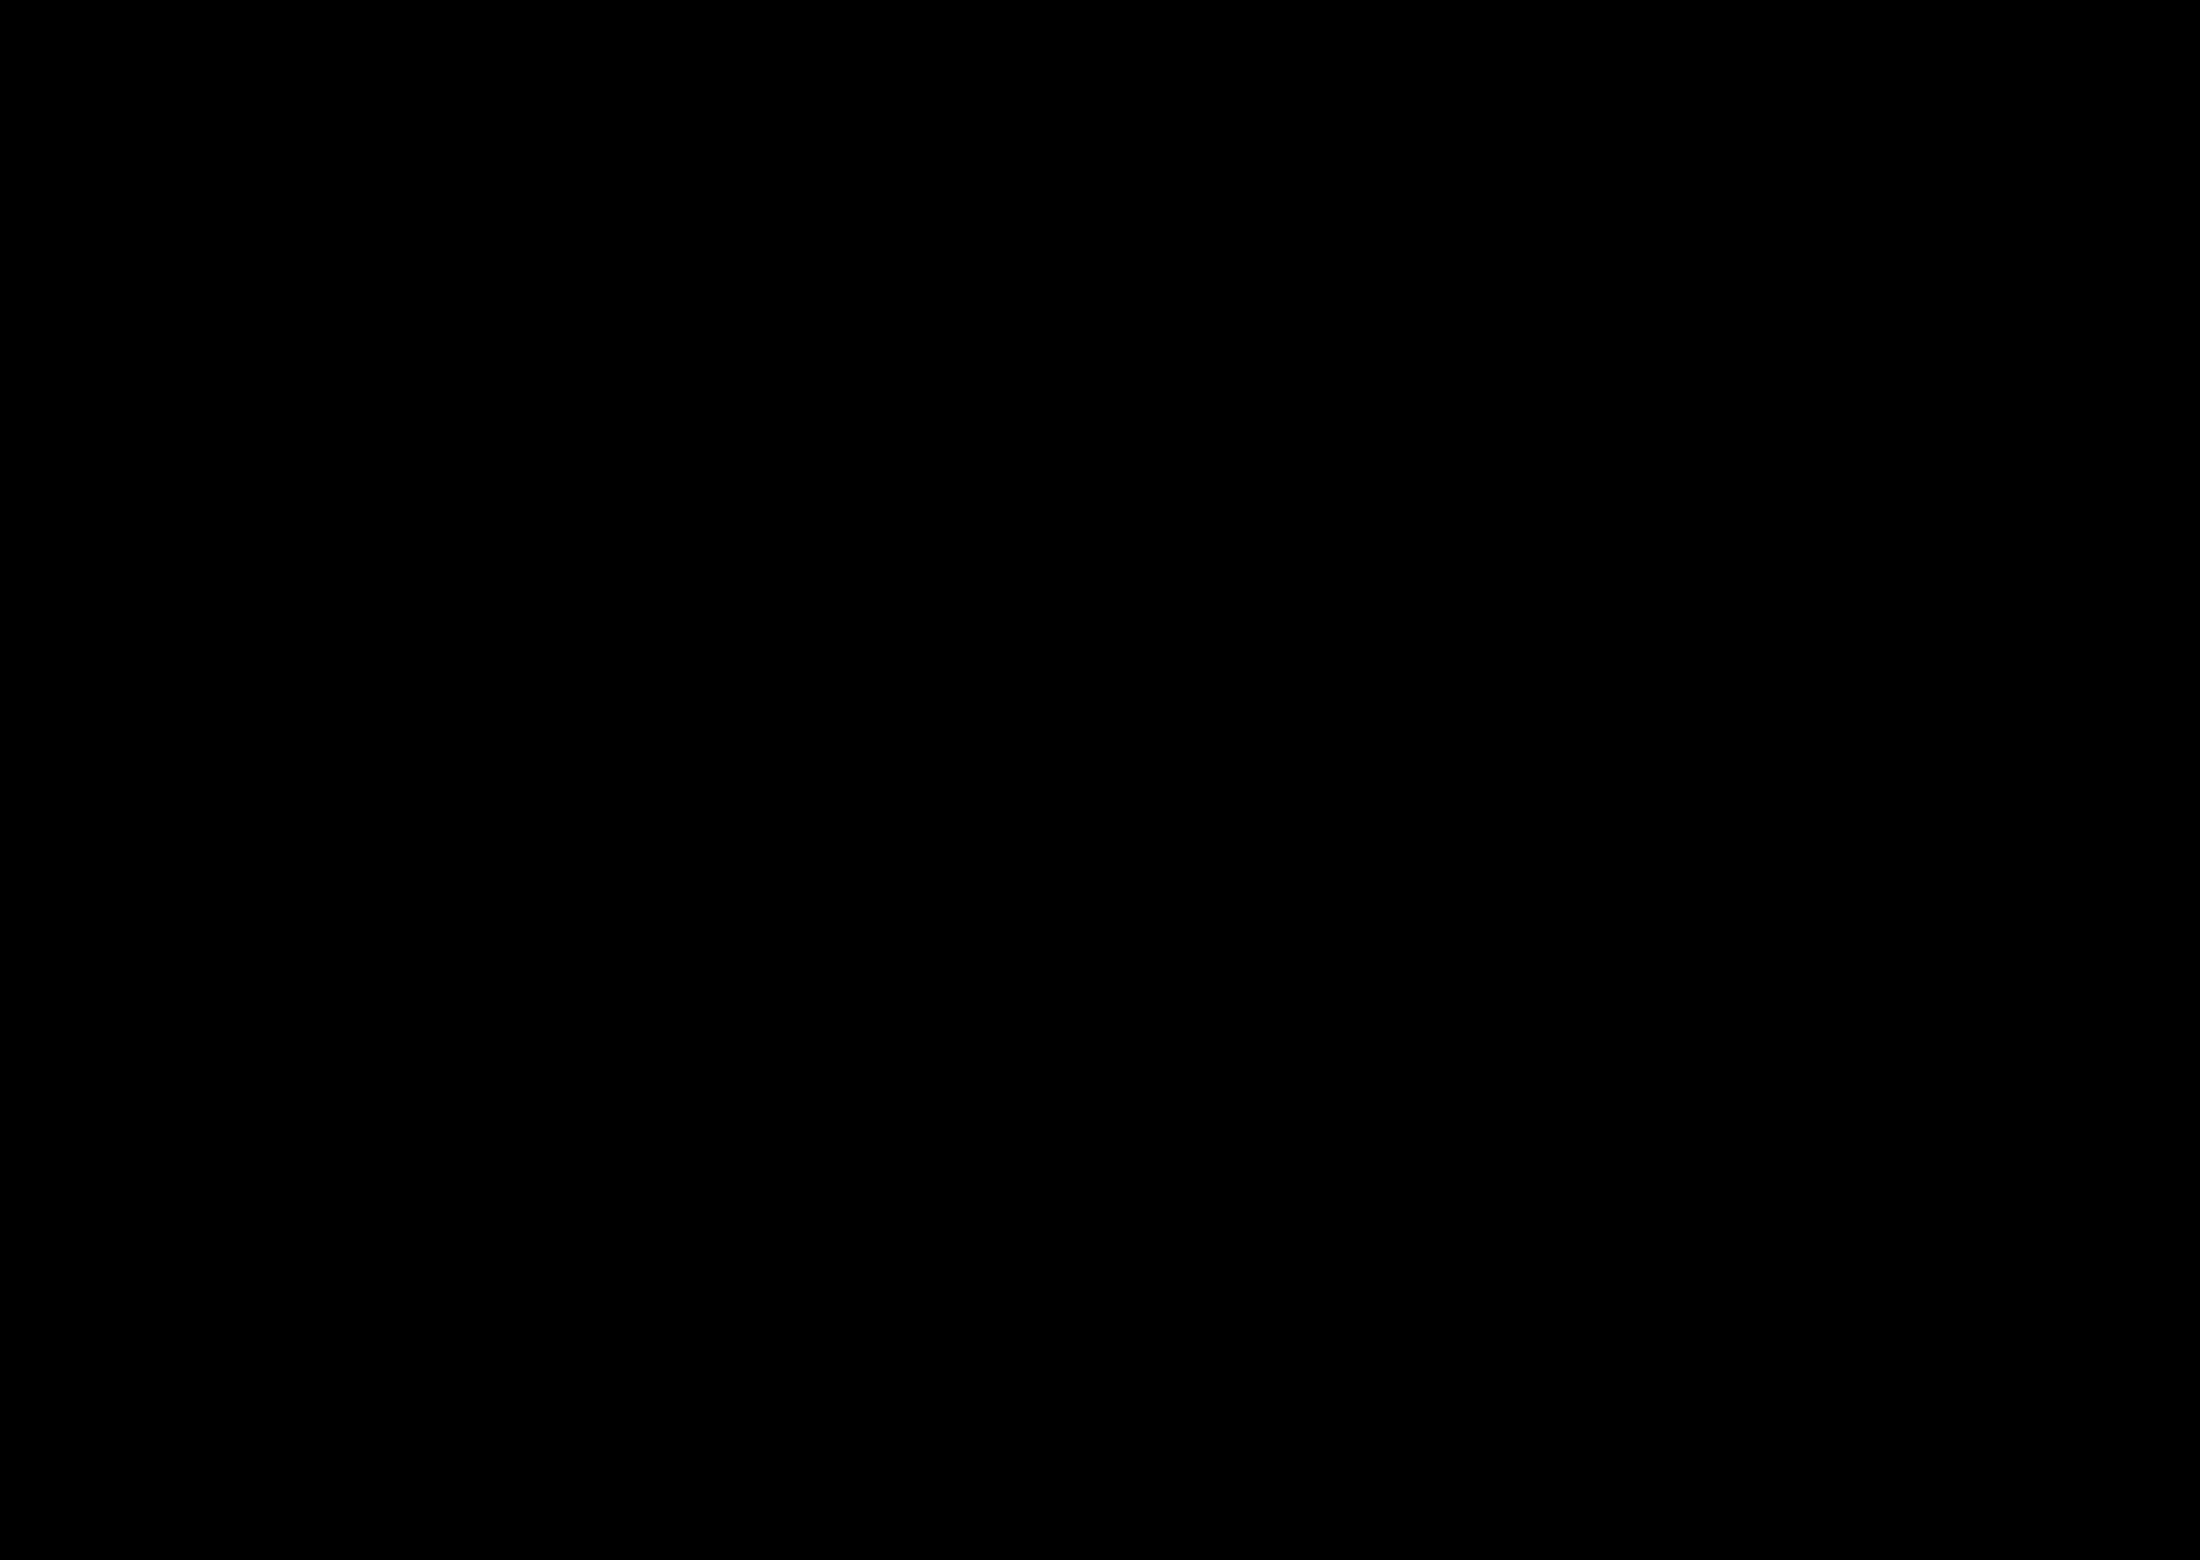 AMADEI INSIEME A TÜV RHEINLAND PER ISO 9001